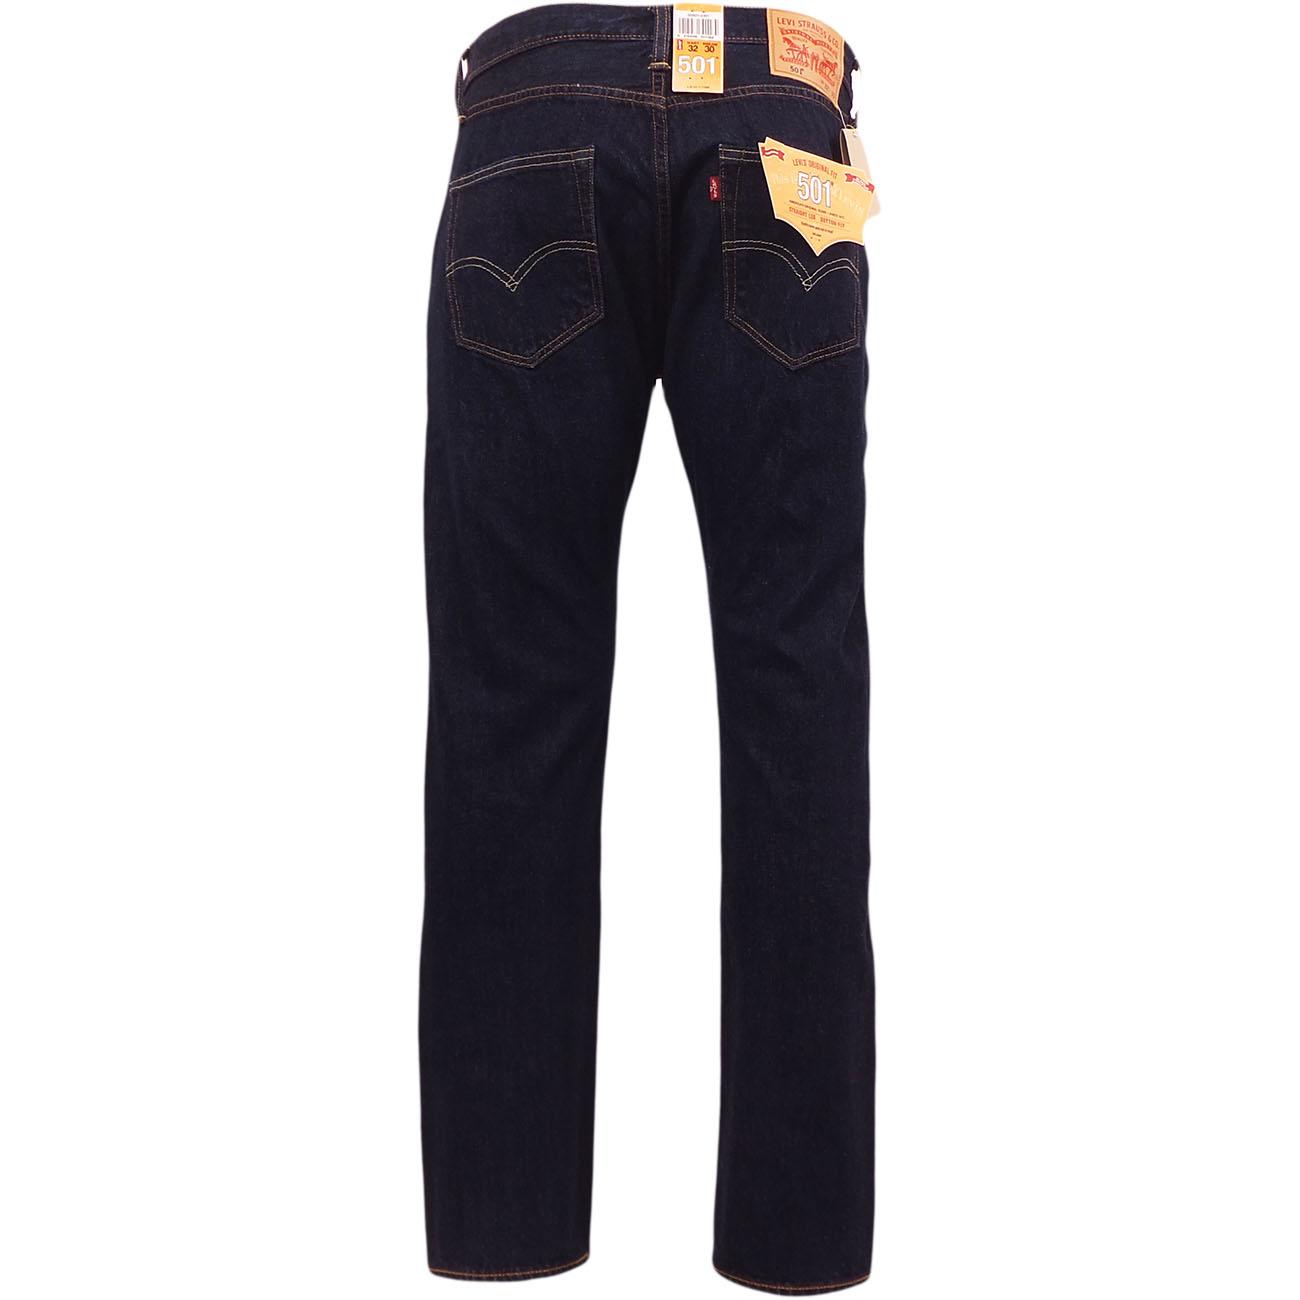 2ea6f2e9db Mens Levi s 501 Denim Jean One Wash Indigo Dark Blue New Original ...